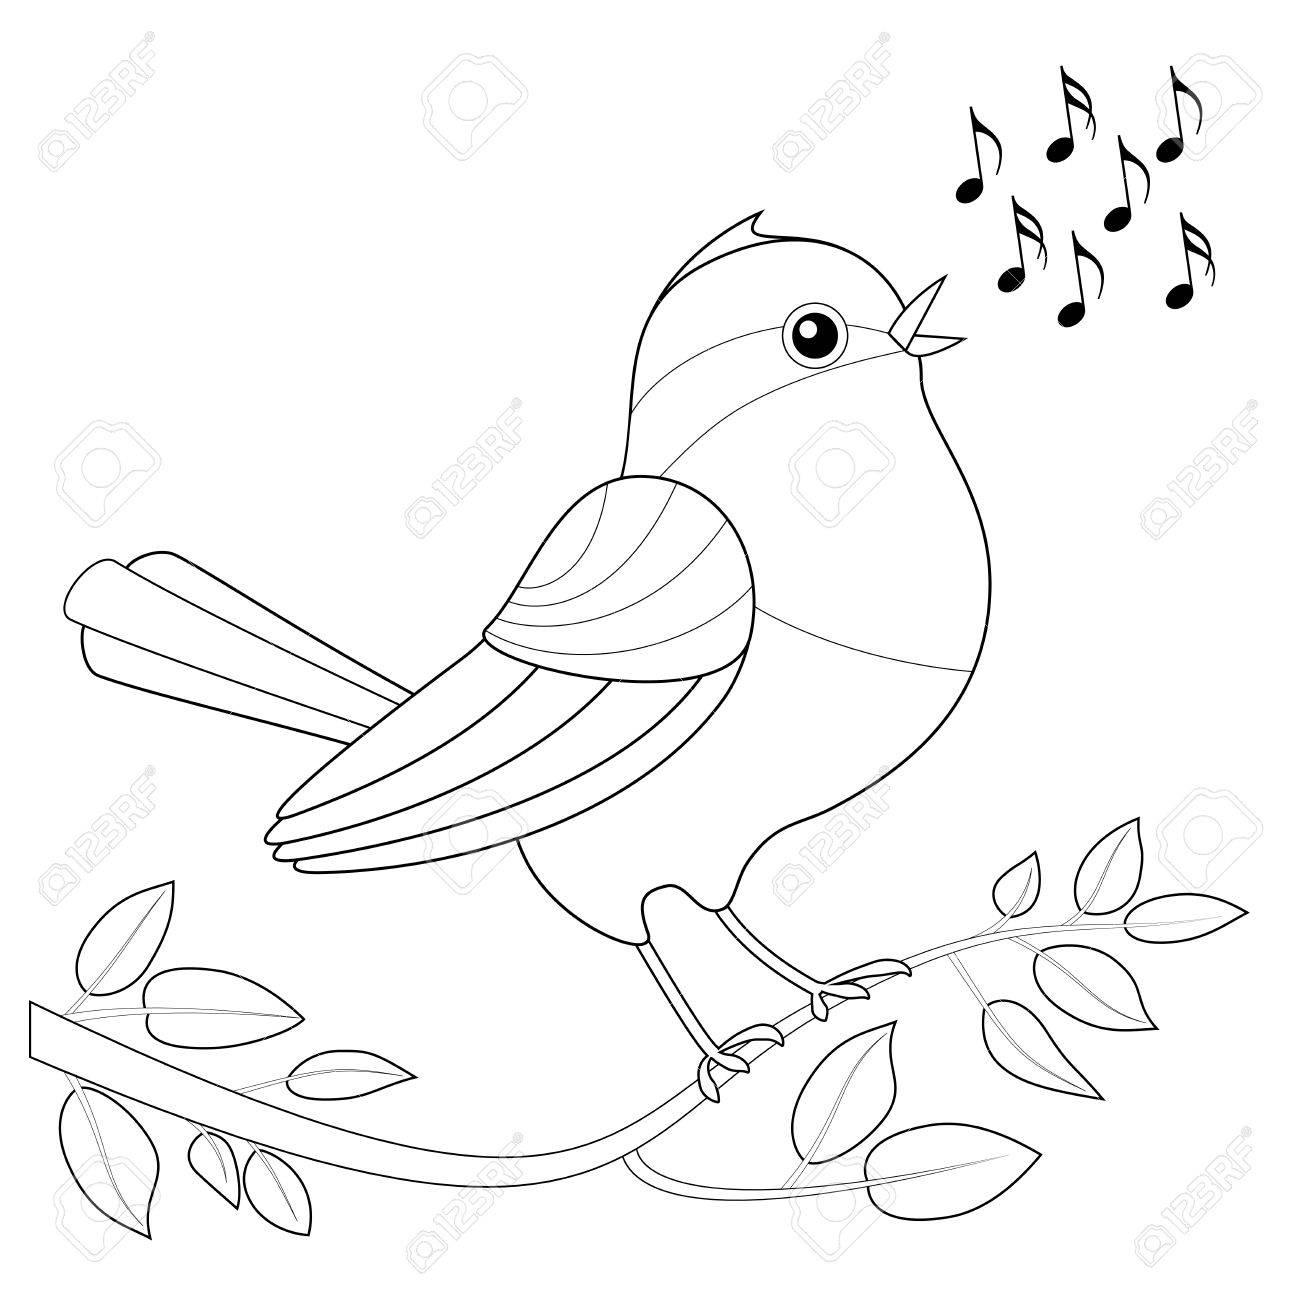 Songbird Imagen Para Colorear Pájaro Del Canto Con Notas De Espera Para Ser Coloreado